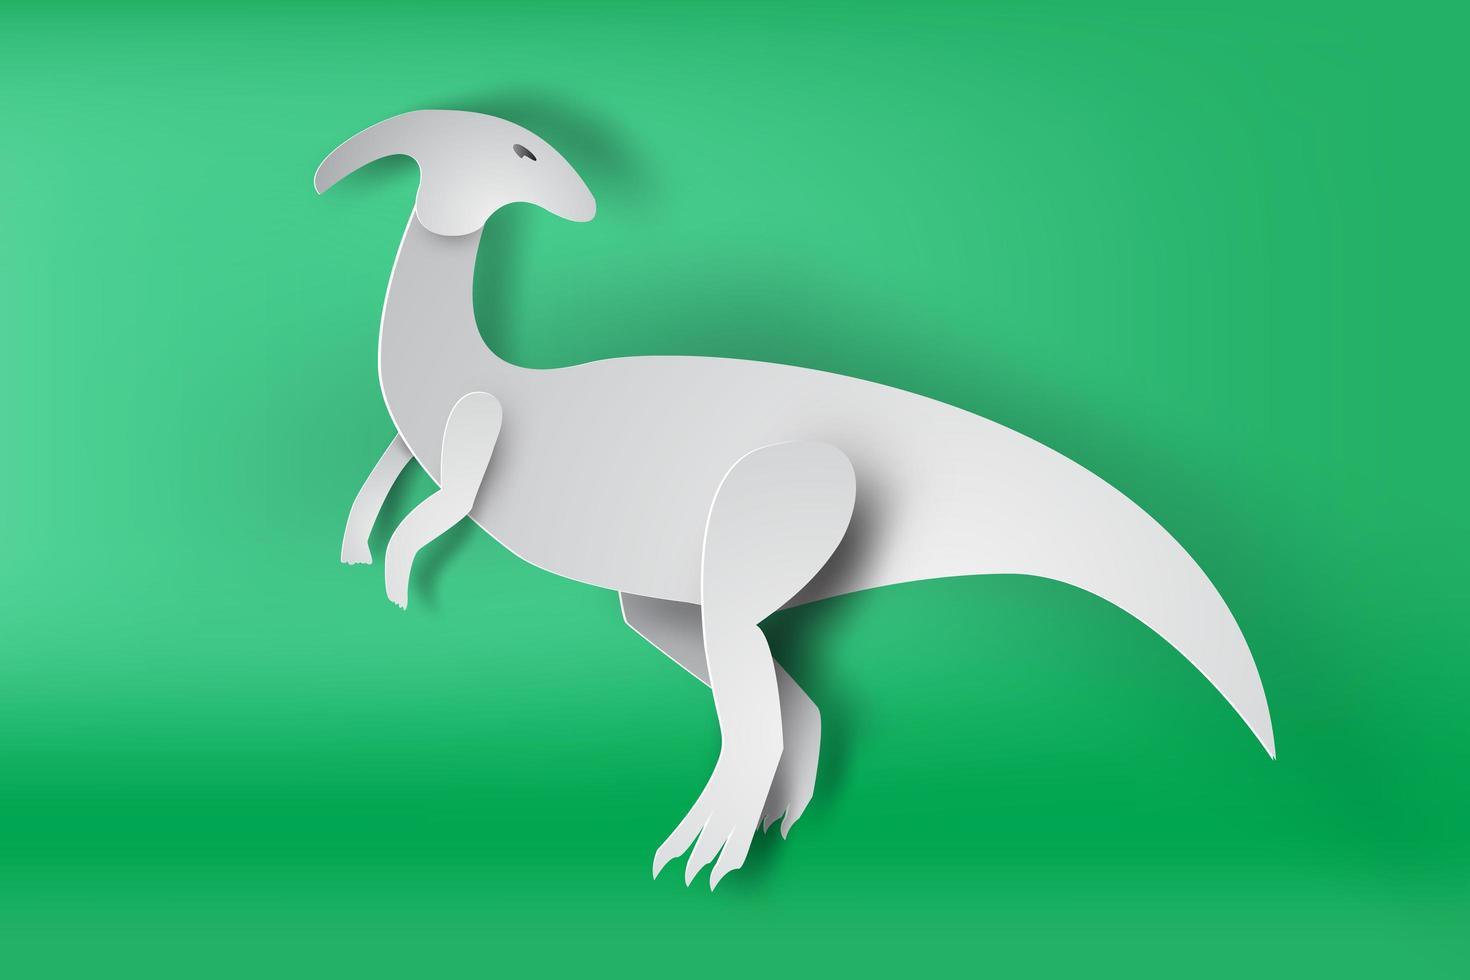 papier art parasaurolophus dinosaure vecteur